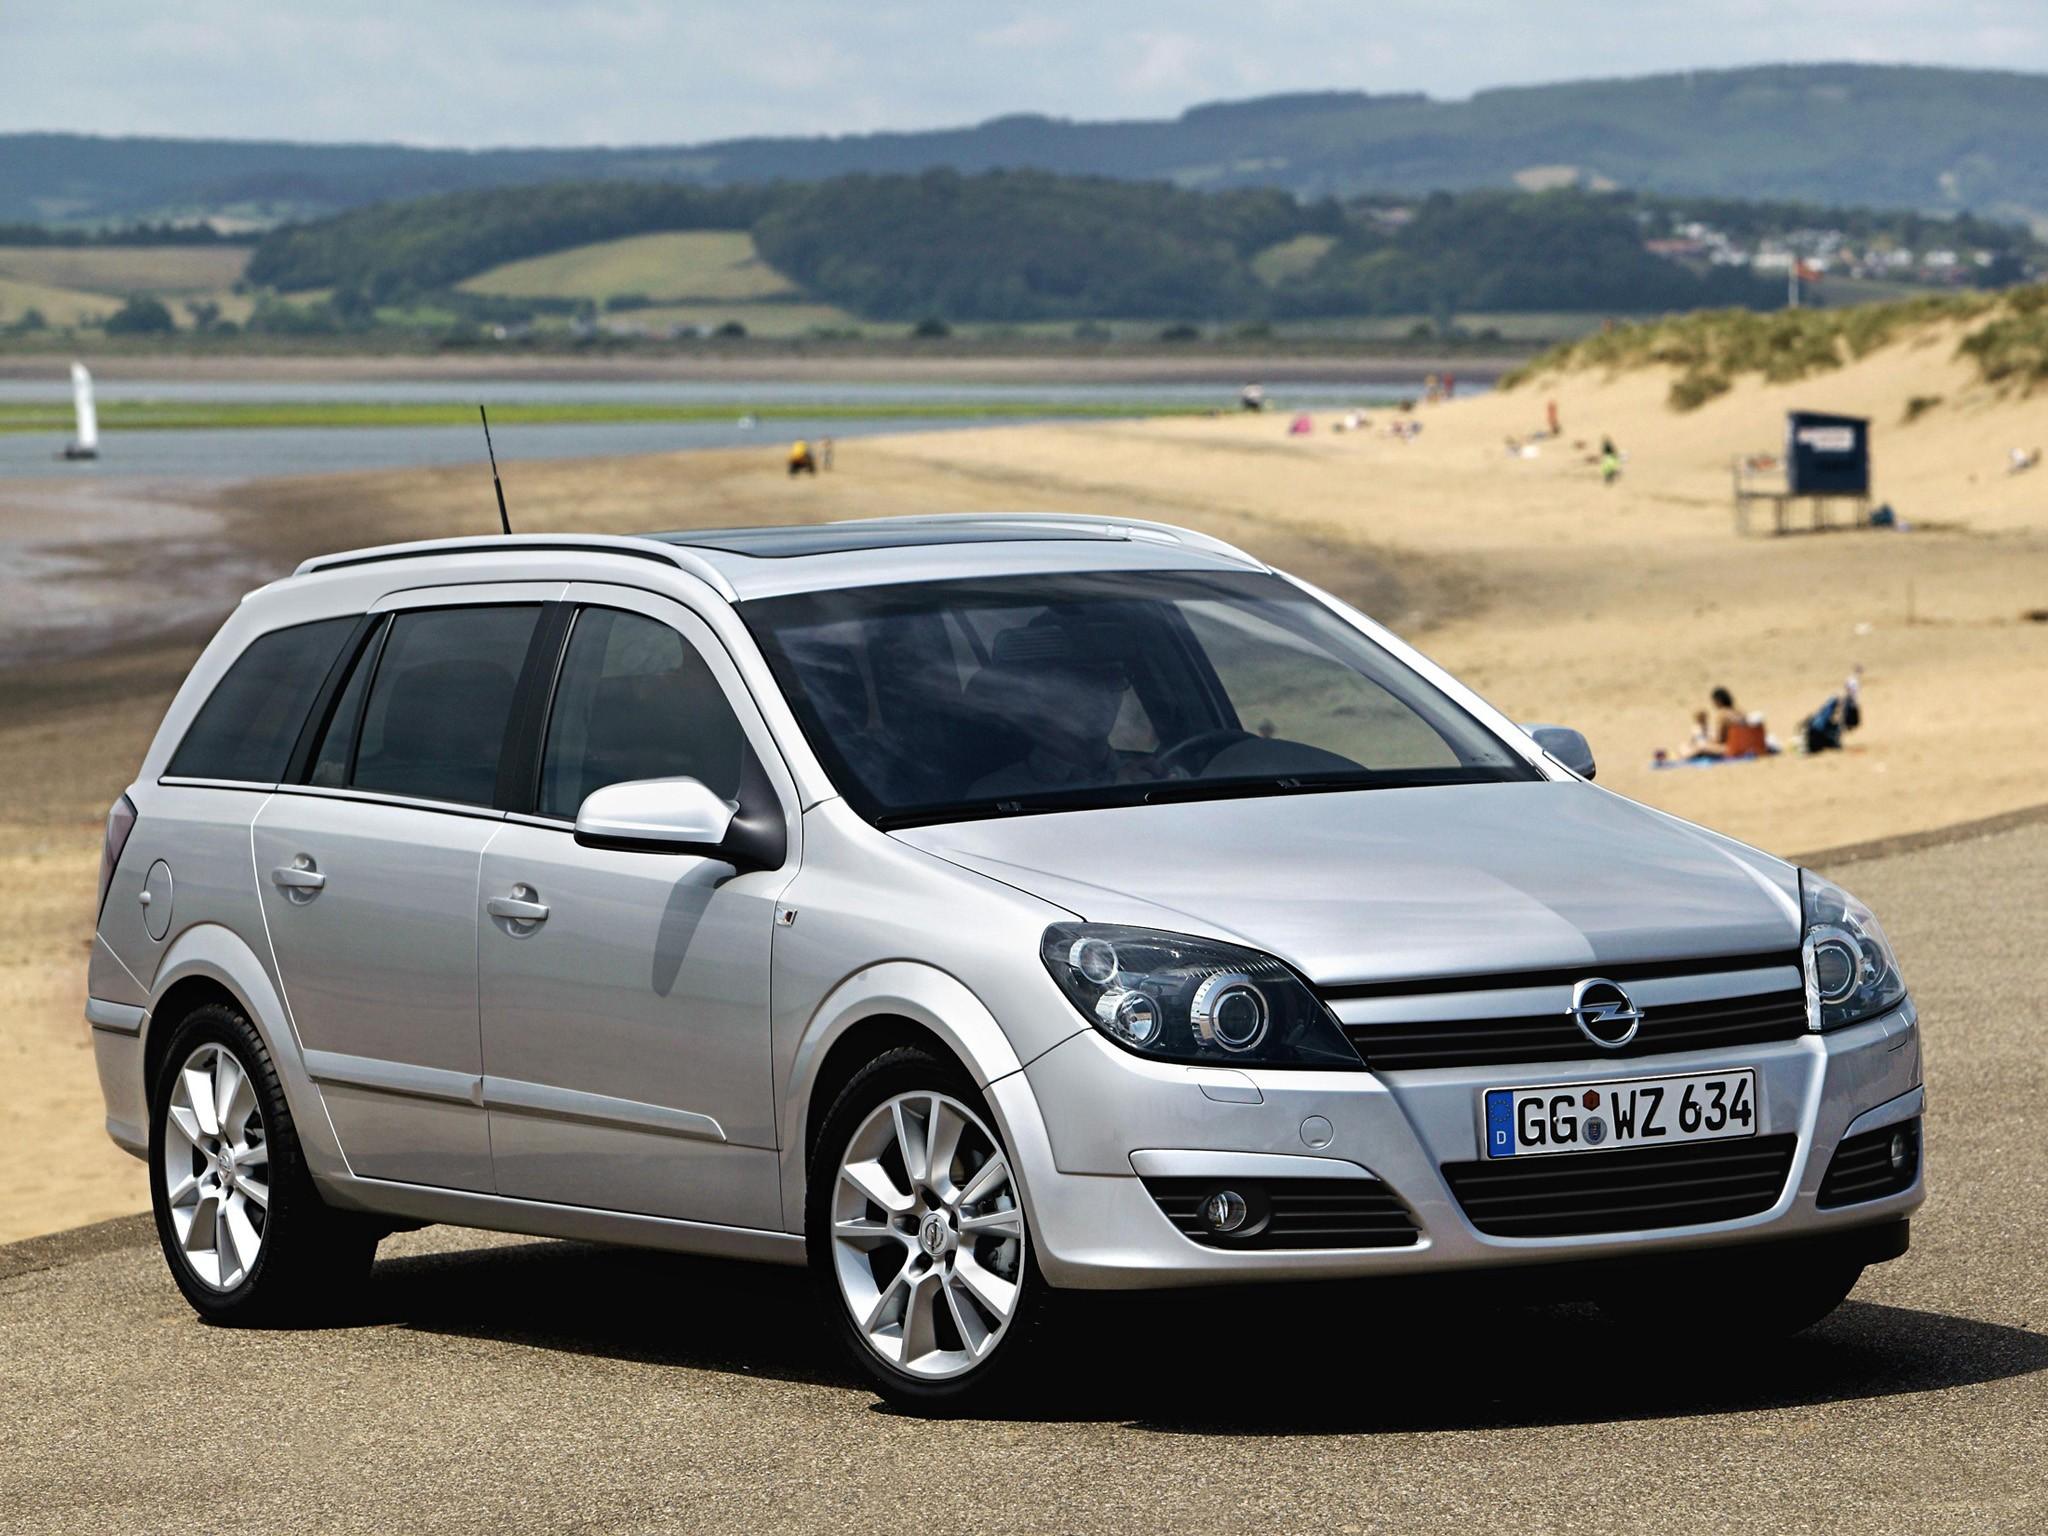 Opel Astra Caravan Specs Amp Photos 2004 2005 2006 2007 2008 2009 2010 2011 Autoevolution